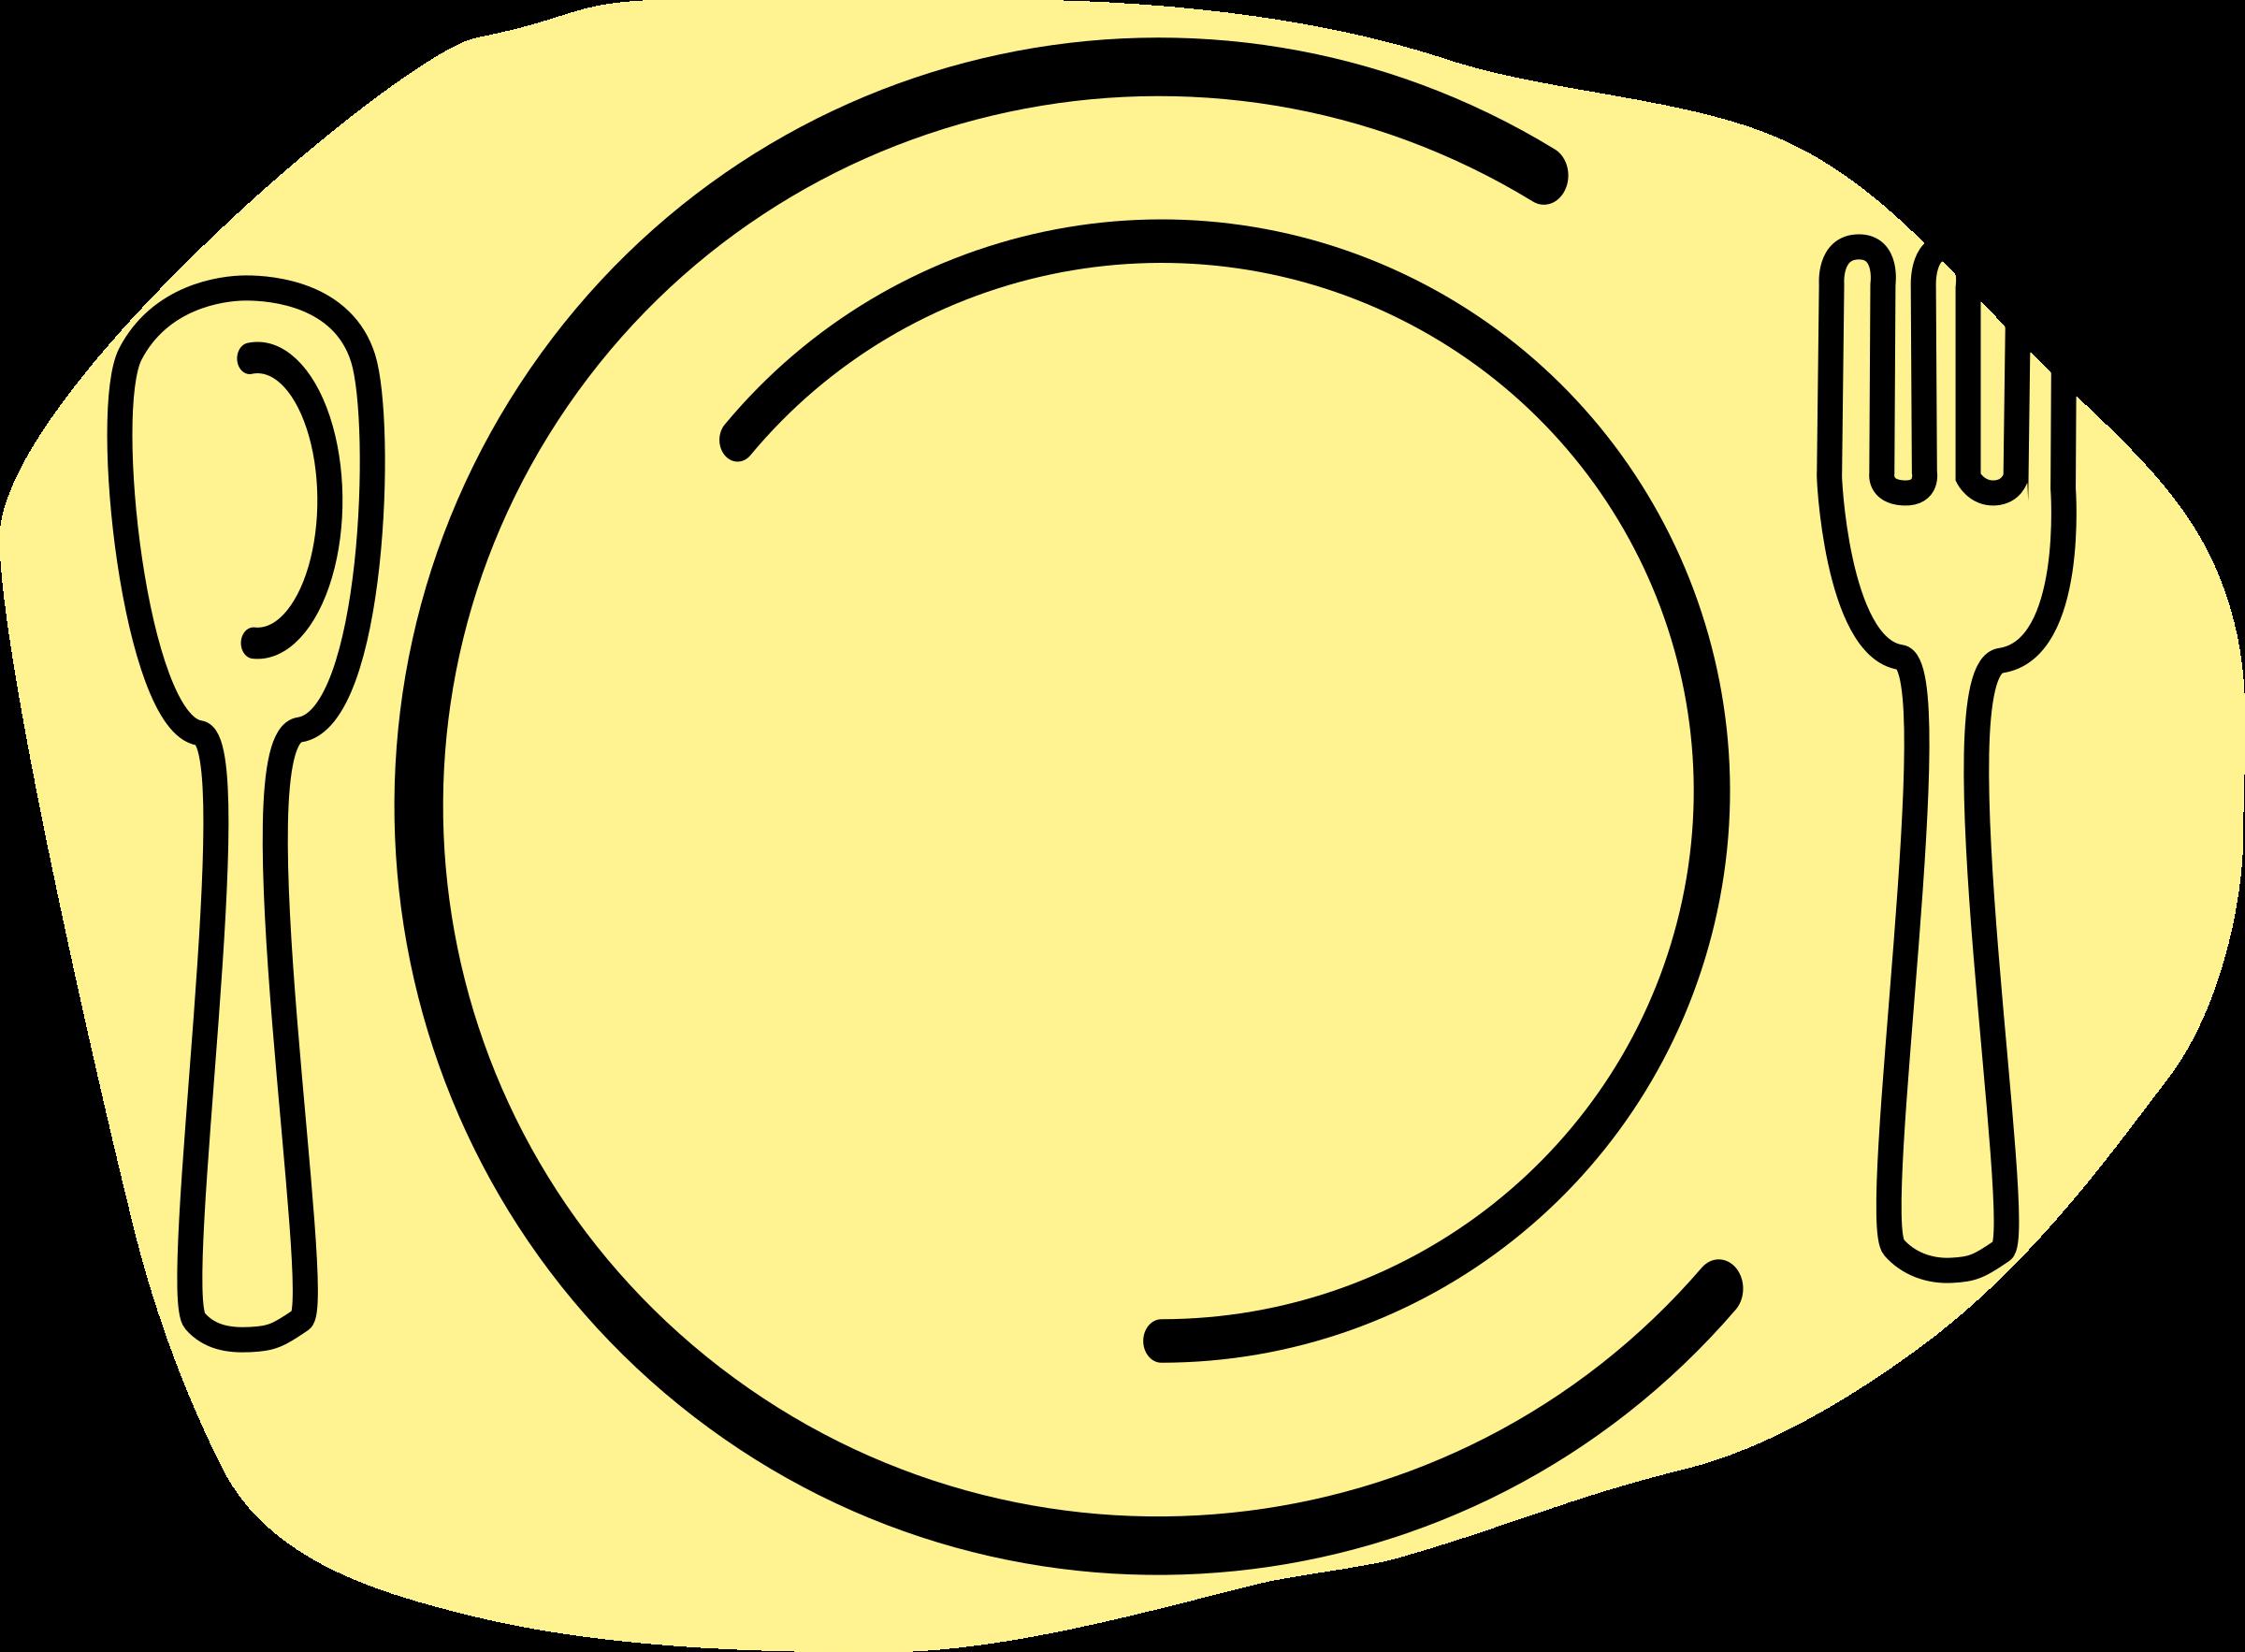 2400x1766 Free Pandora Community Meal Jan. 31 The Bluffton Icon